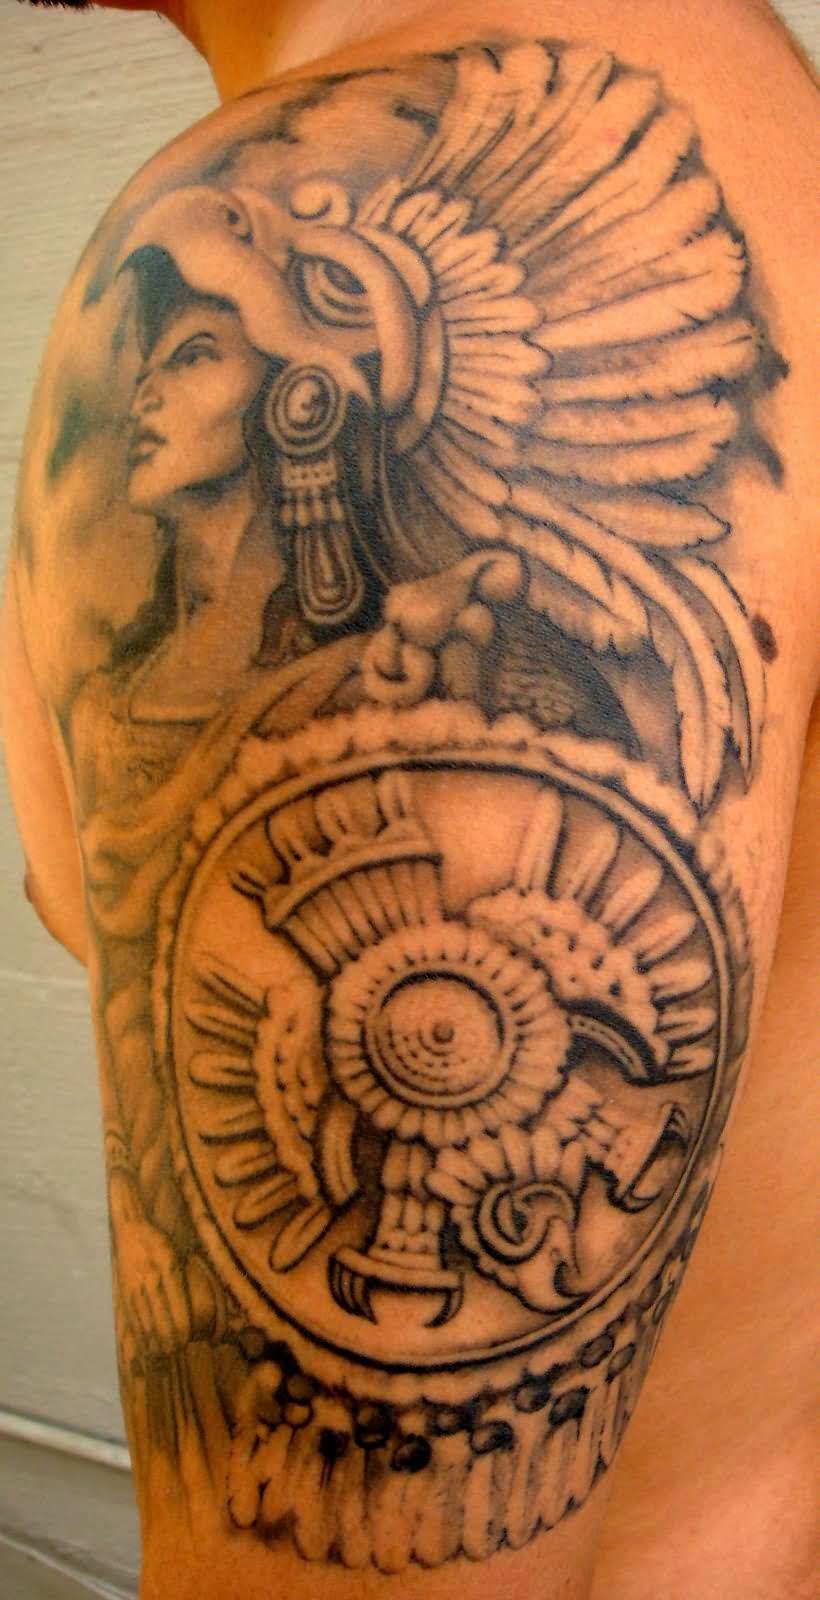 Aztec Tattoos | Best Art Designs